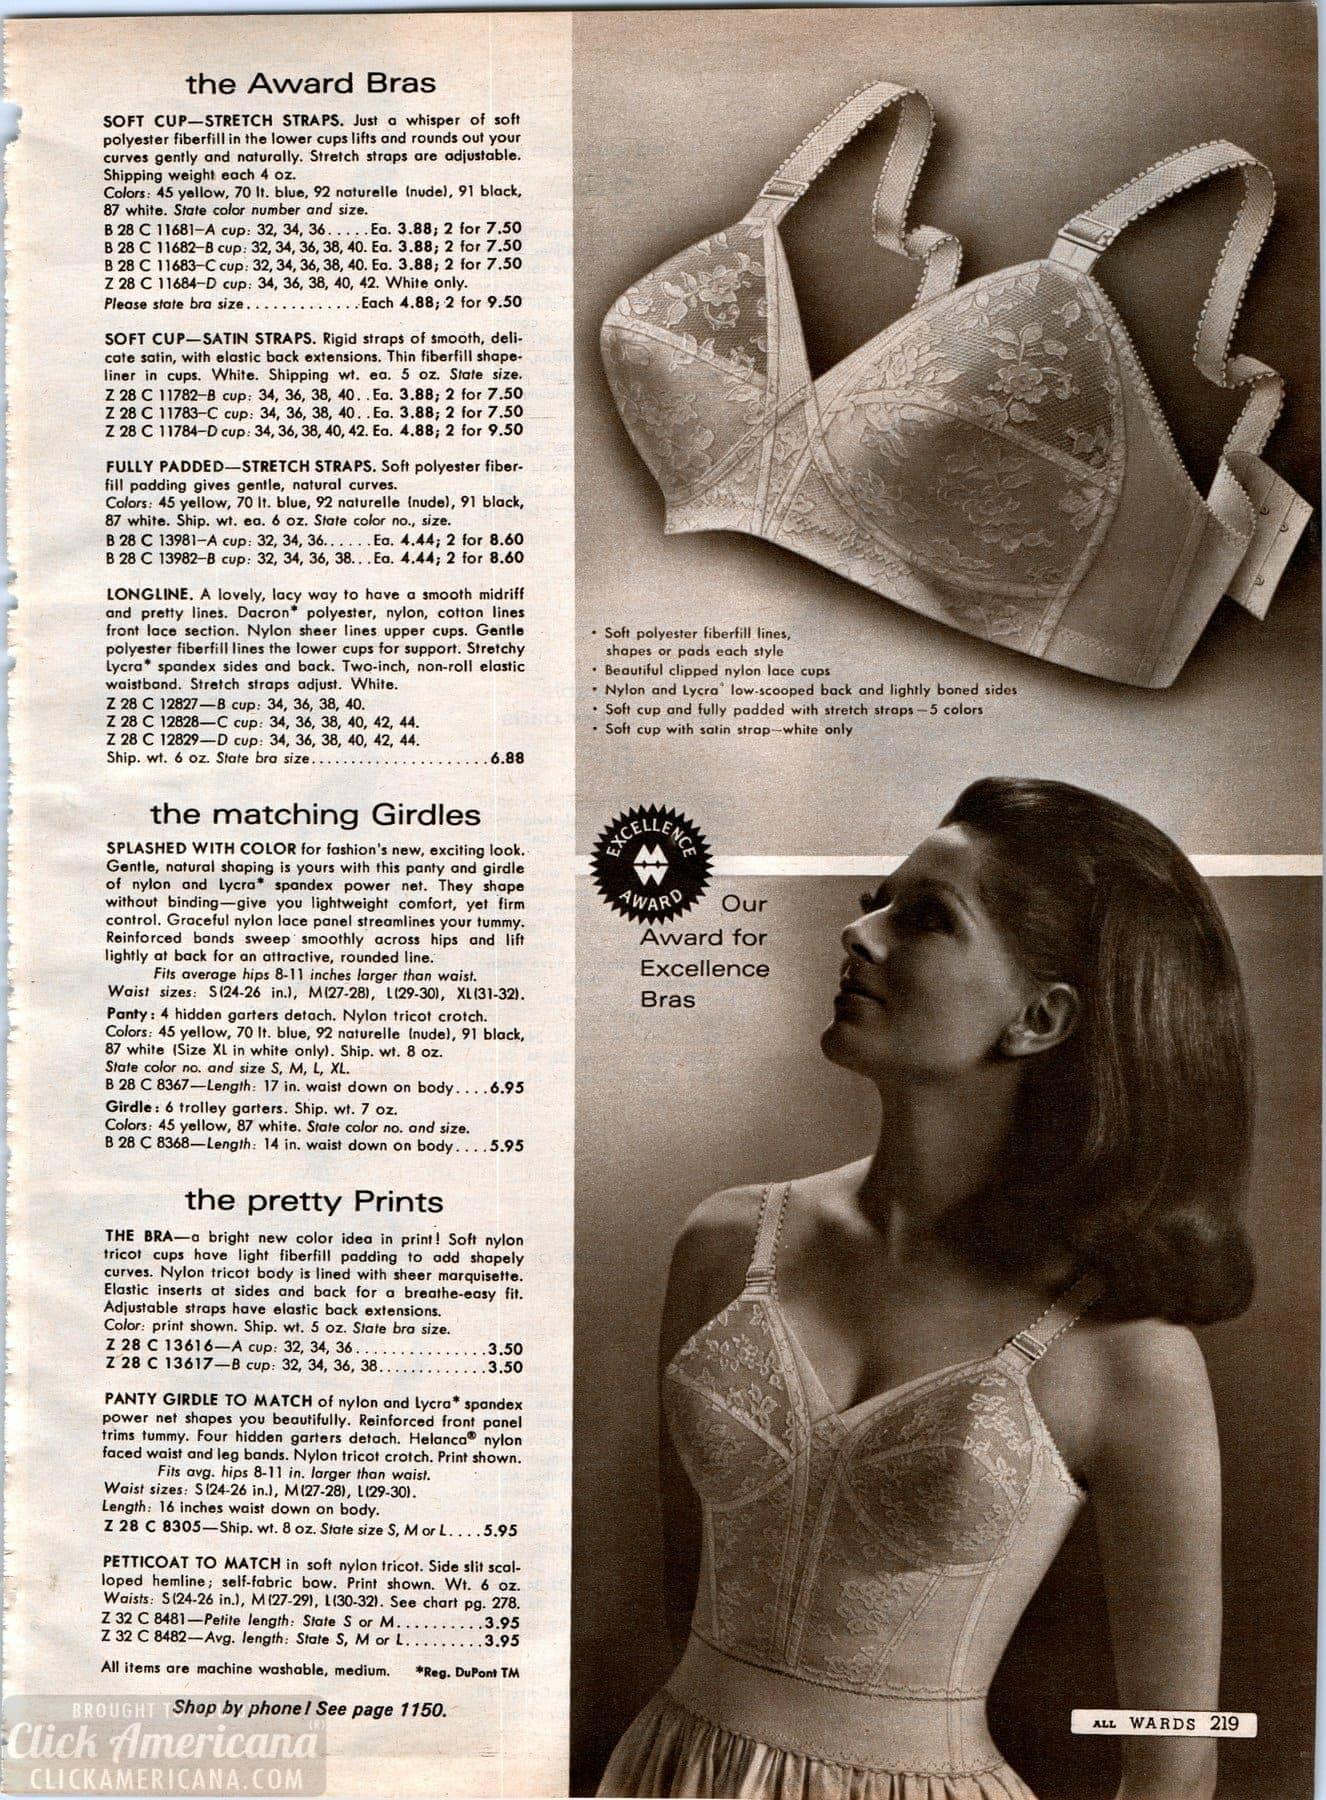 Vintage bra styles from 1968 - Wards catalog